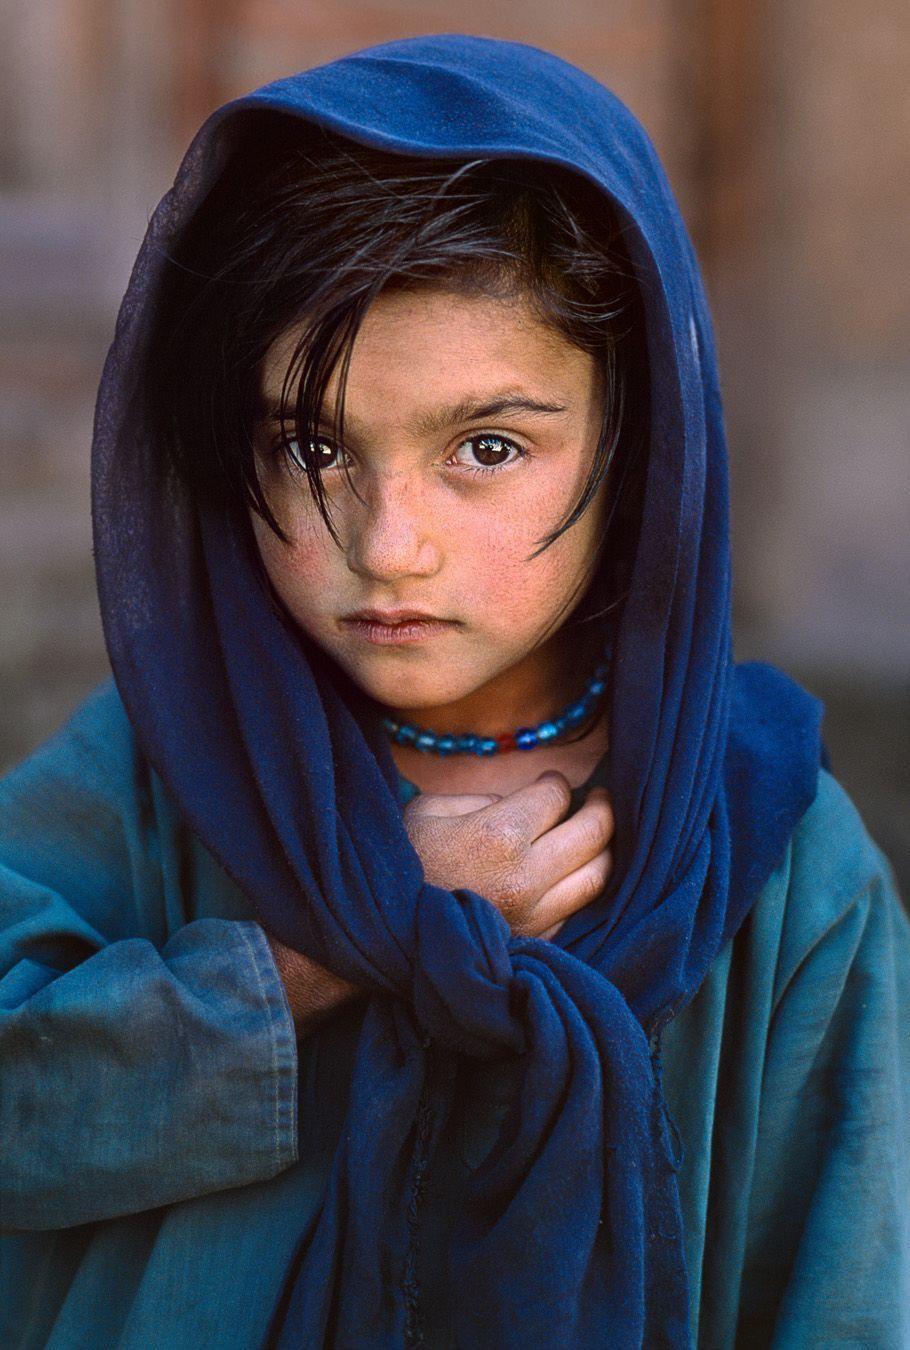 Foulard En Soie Cachemire - St Bleu Touareg Par Vida Vida 2n3jL